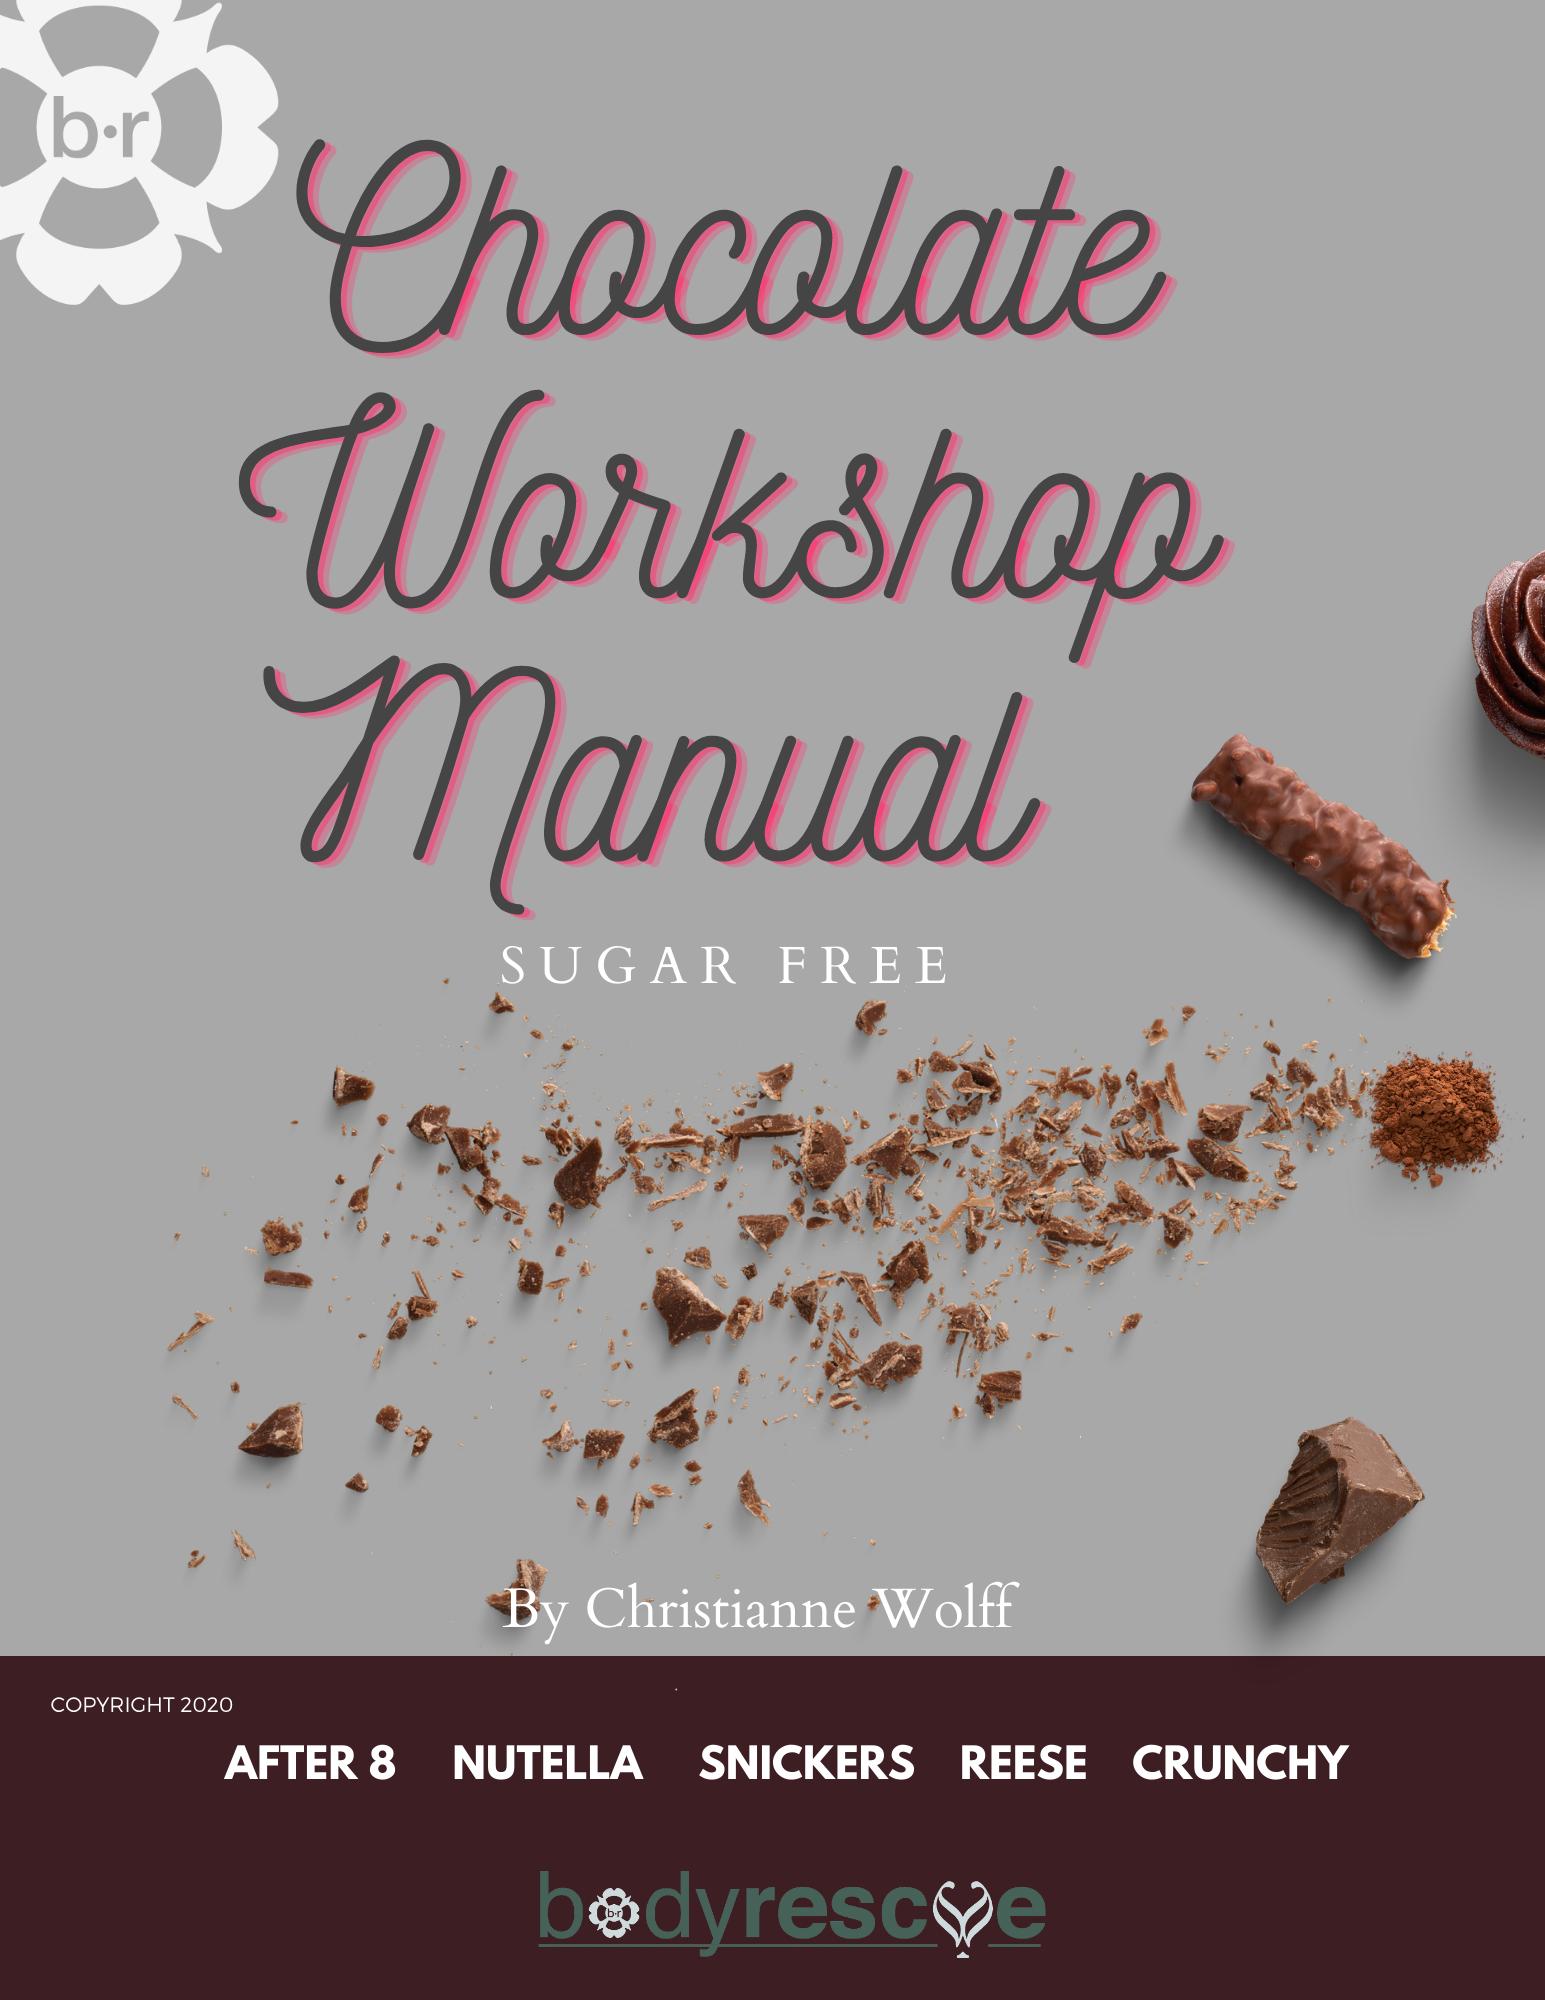 Chocolate workshop manual